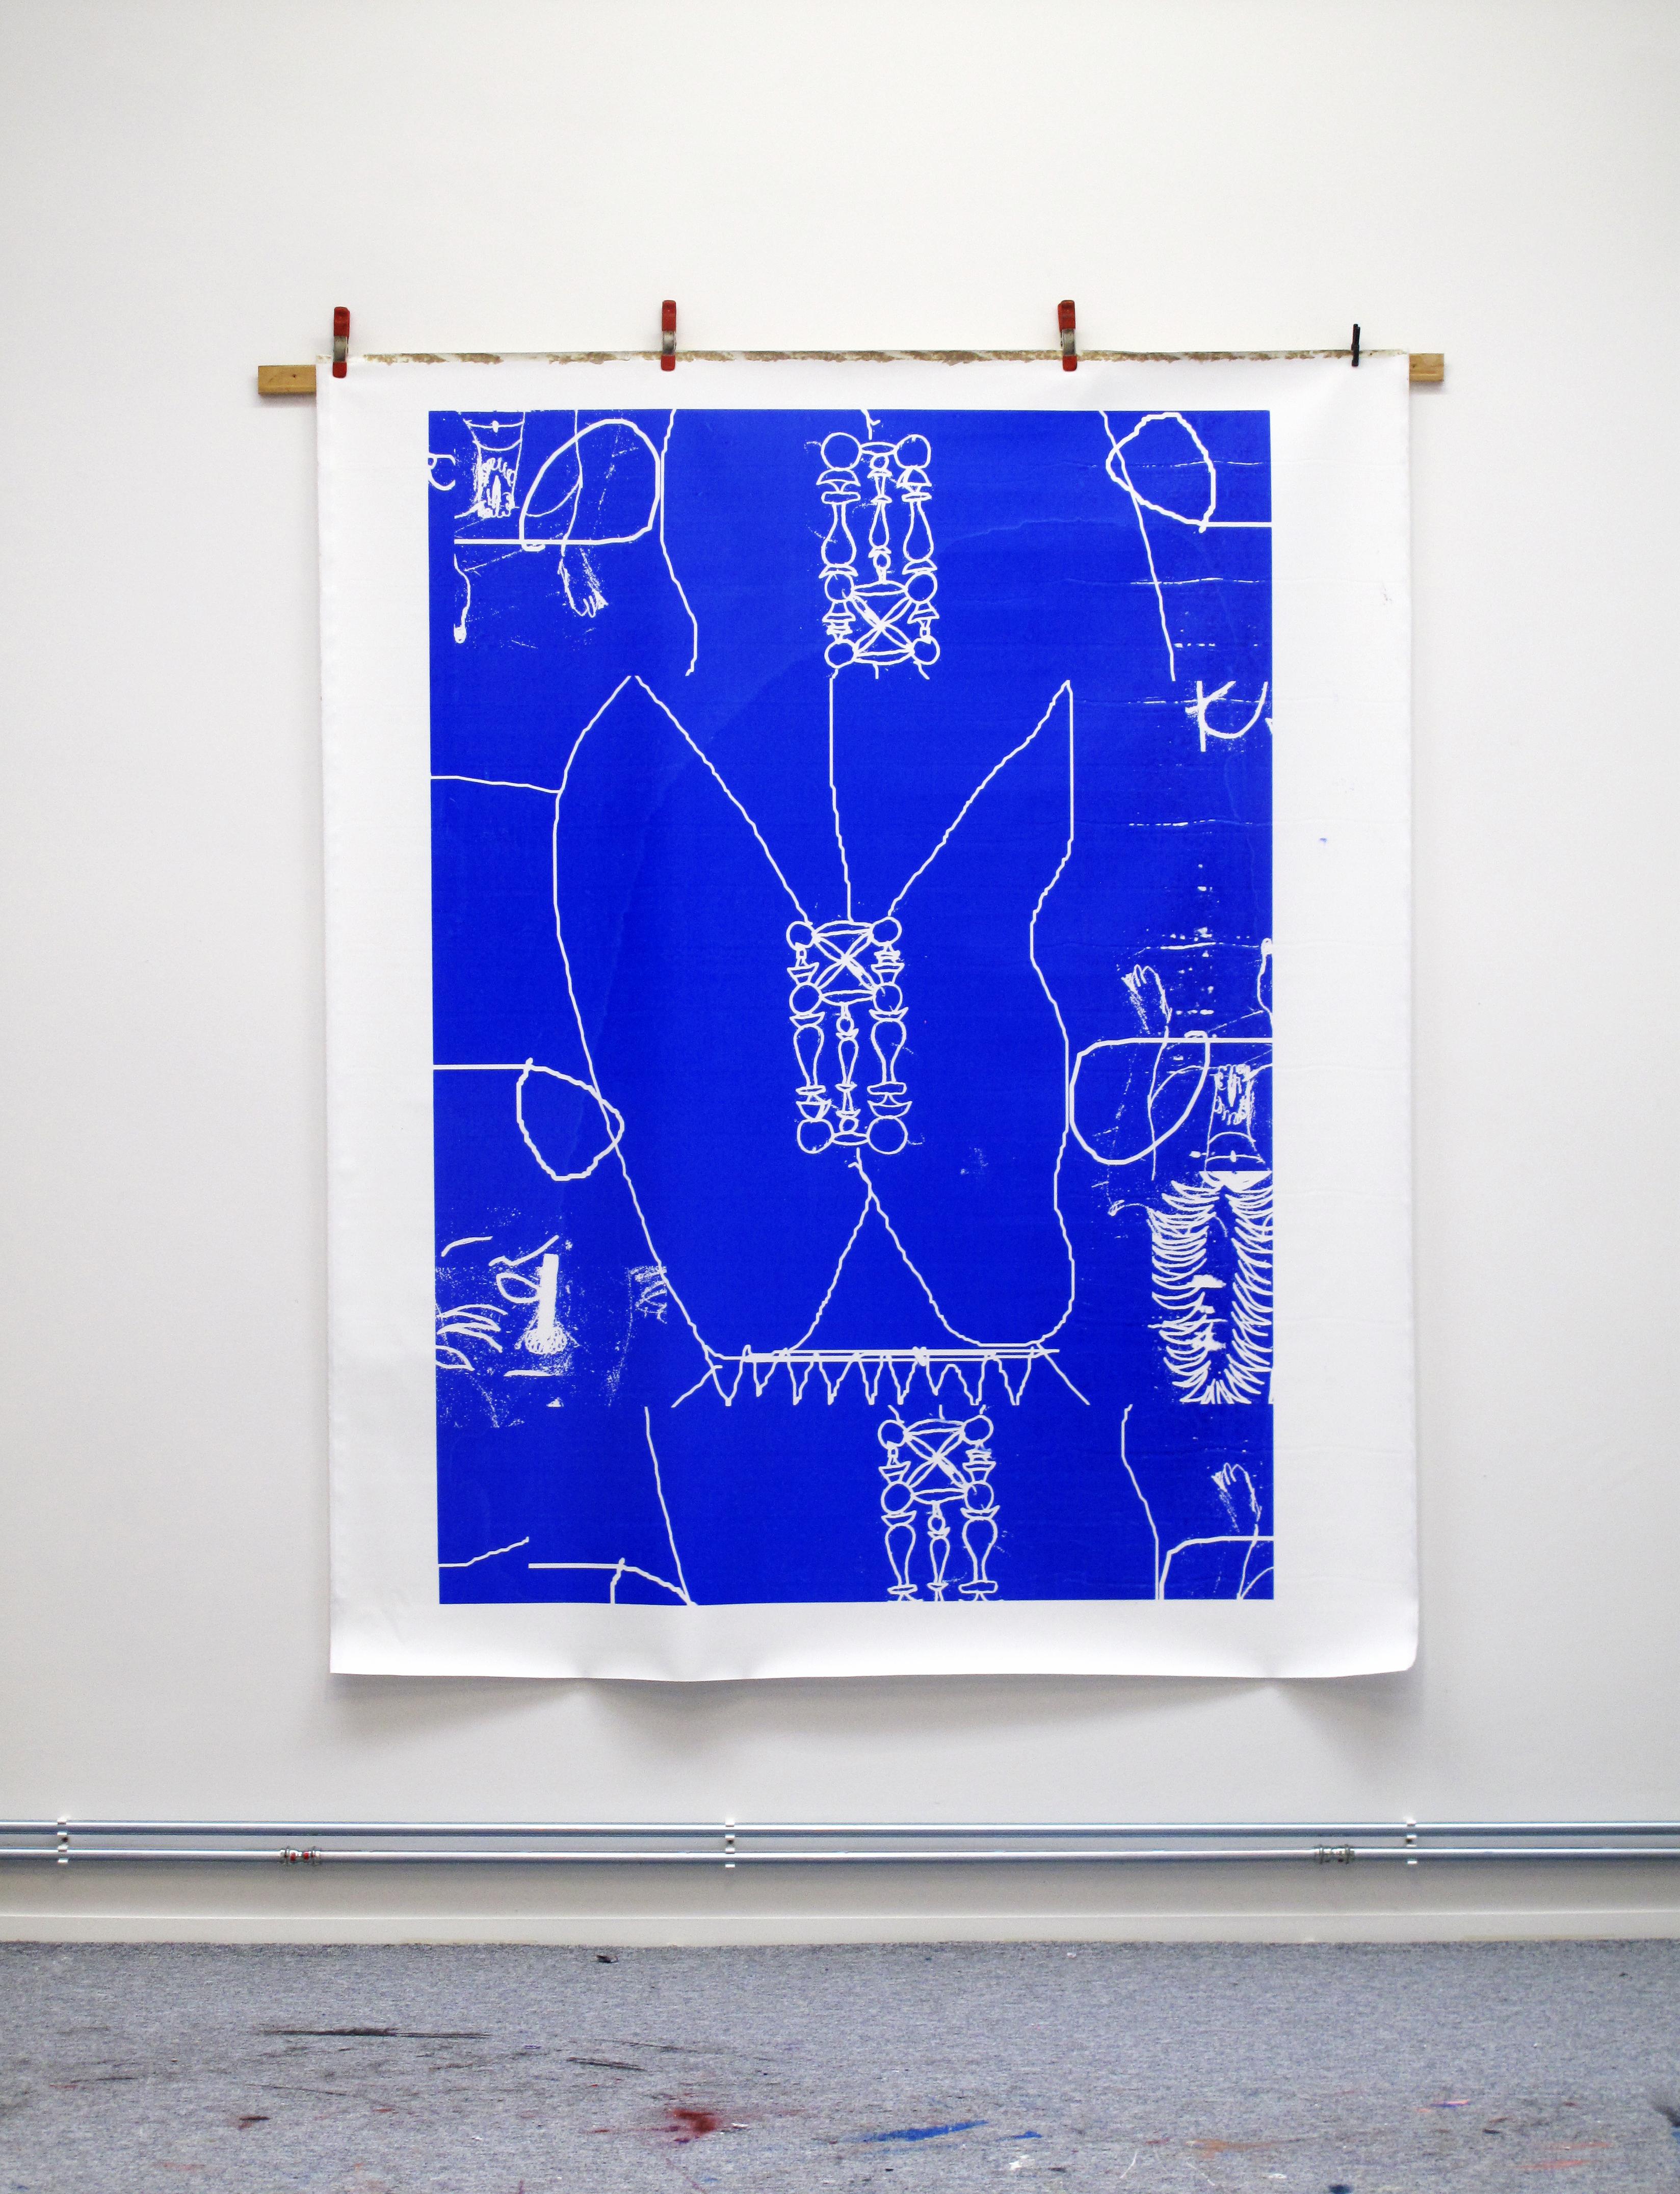 Artwork 2020 / screen print on canvas